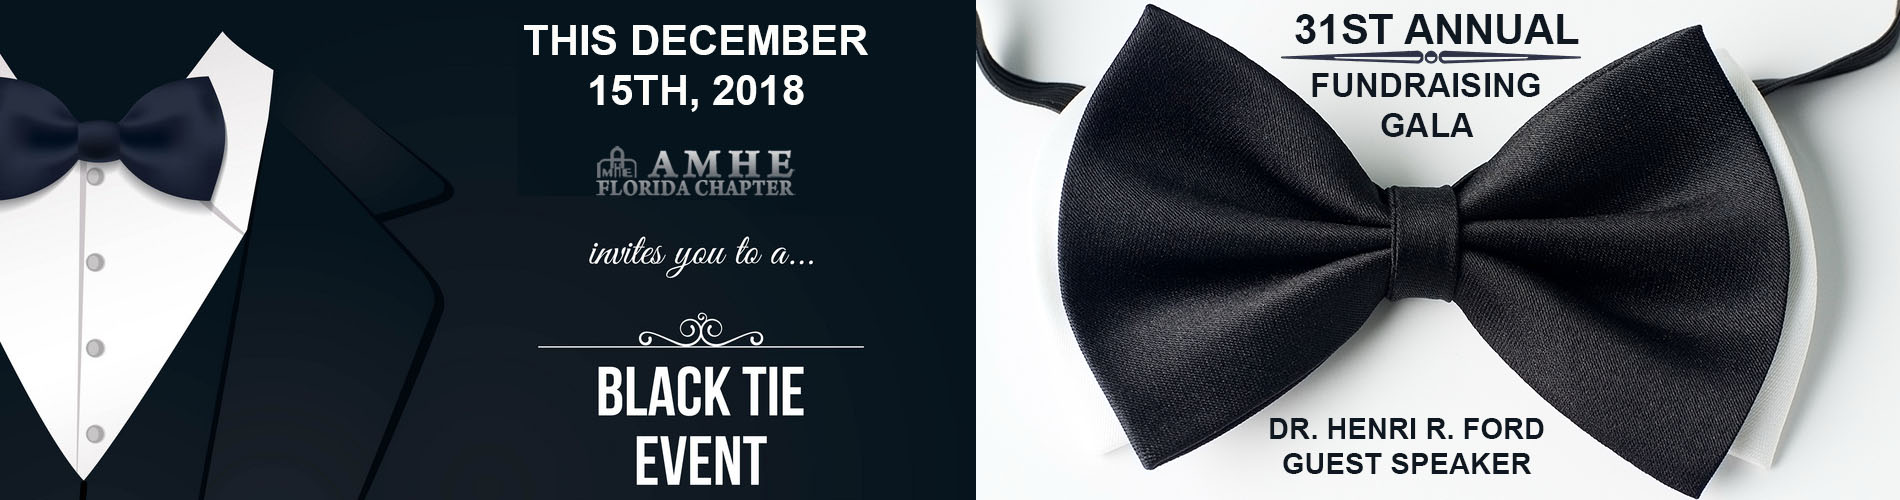 http://amheflorida.org/wp-content/uploads/2018/11/AMHE-Gala-sitebanner.jpg